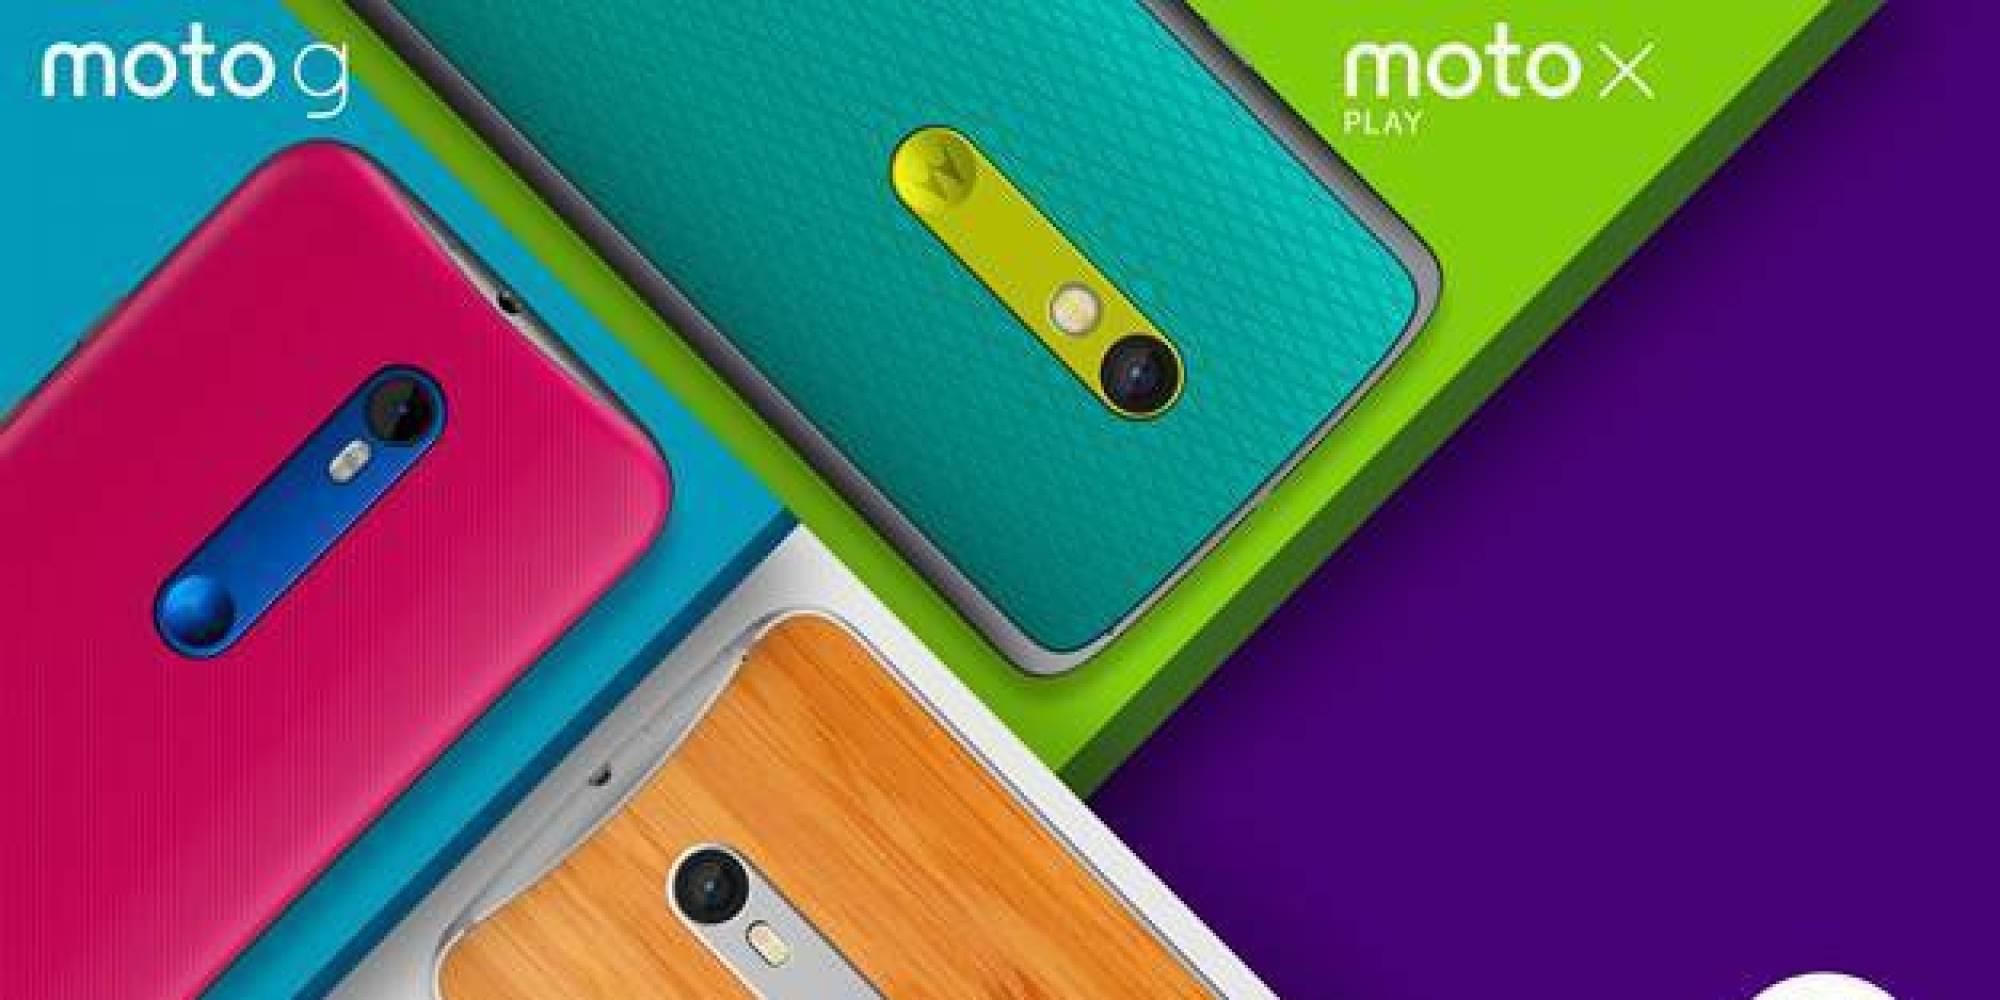 Motorola Unveils New Moto G And Moto X Smartphones ...